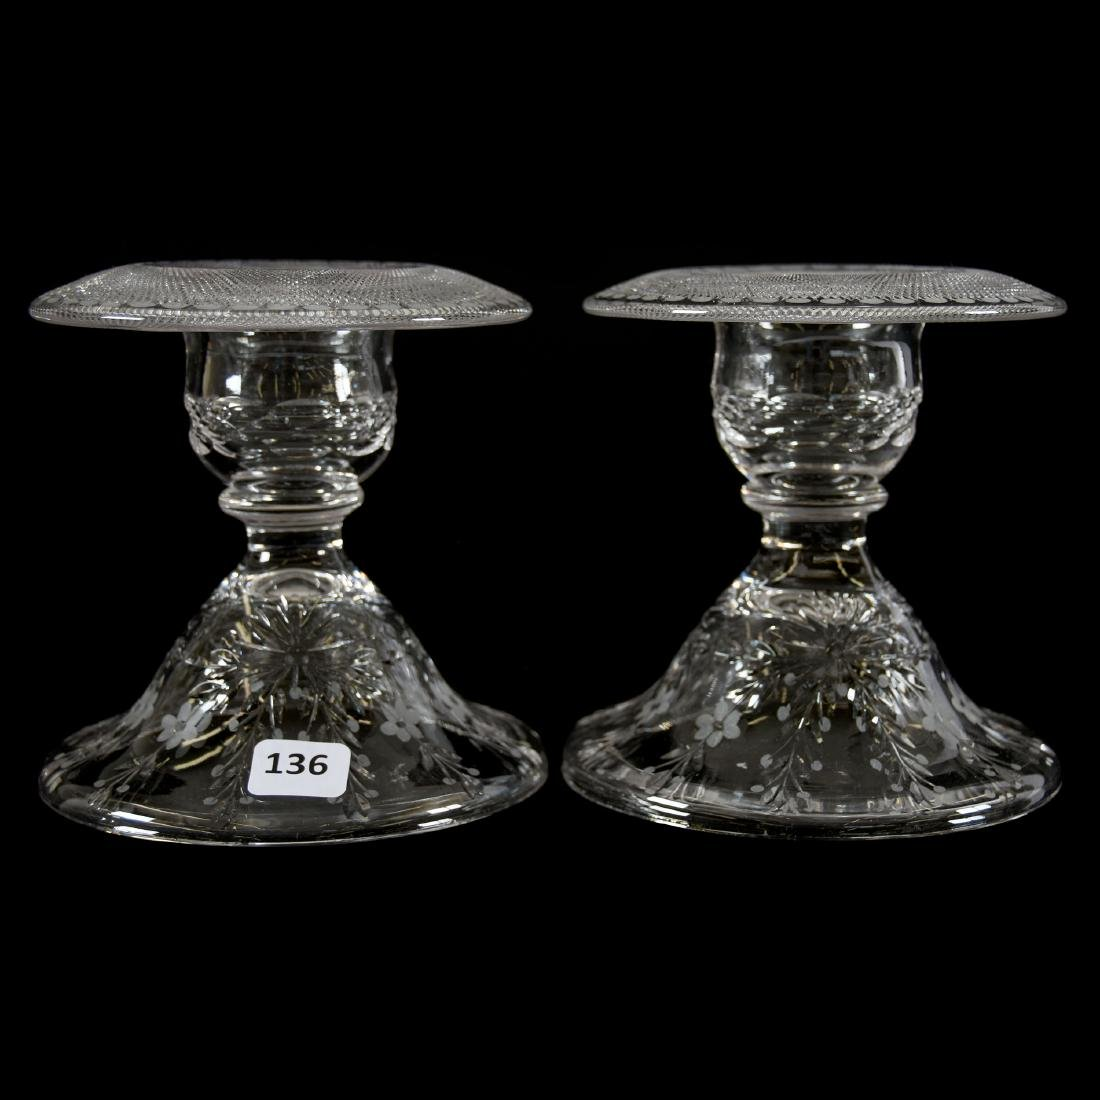 Pair Candlesticks, Engraved Floral Garland Motif